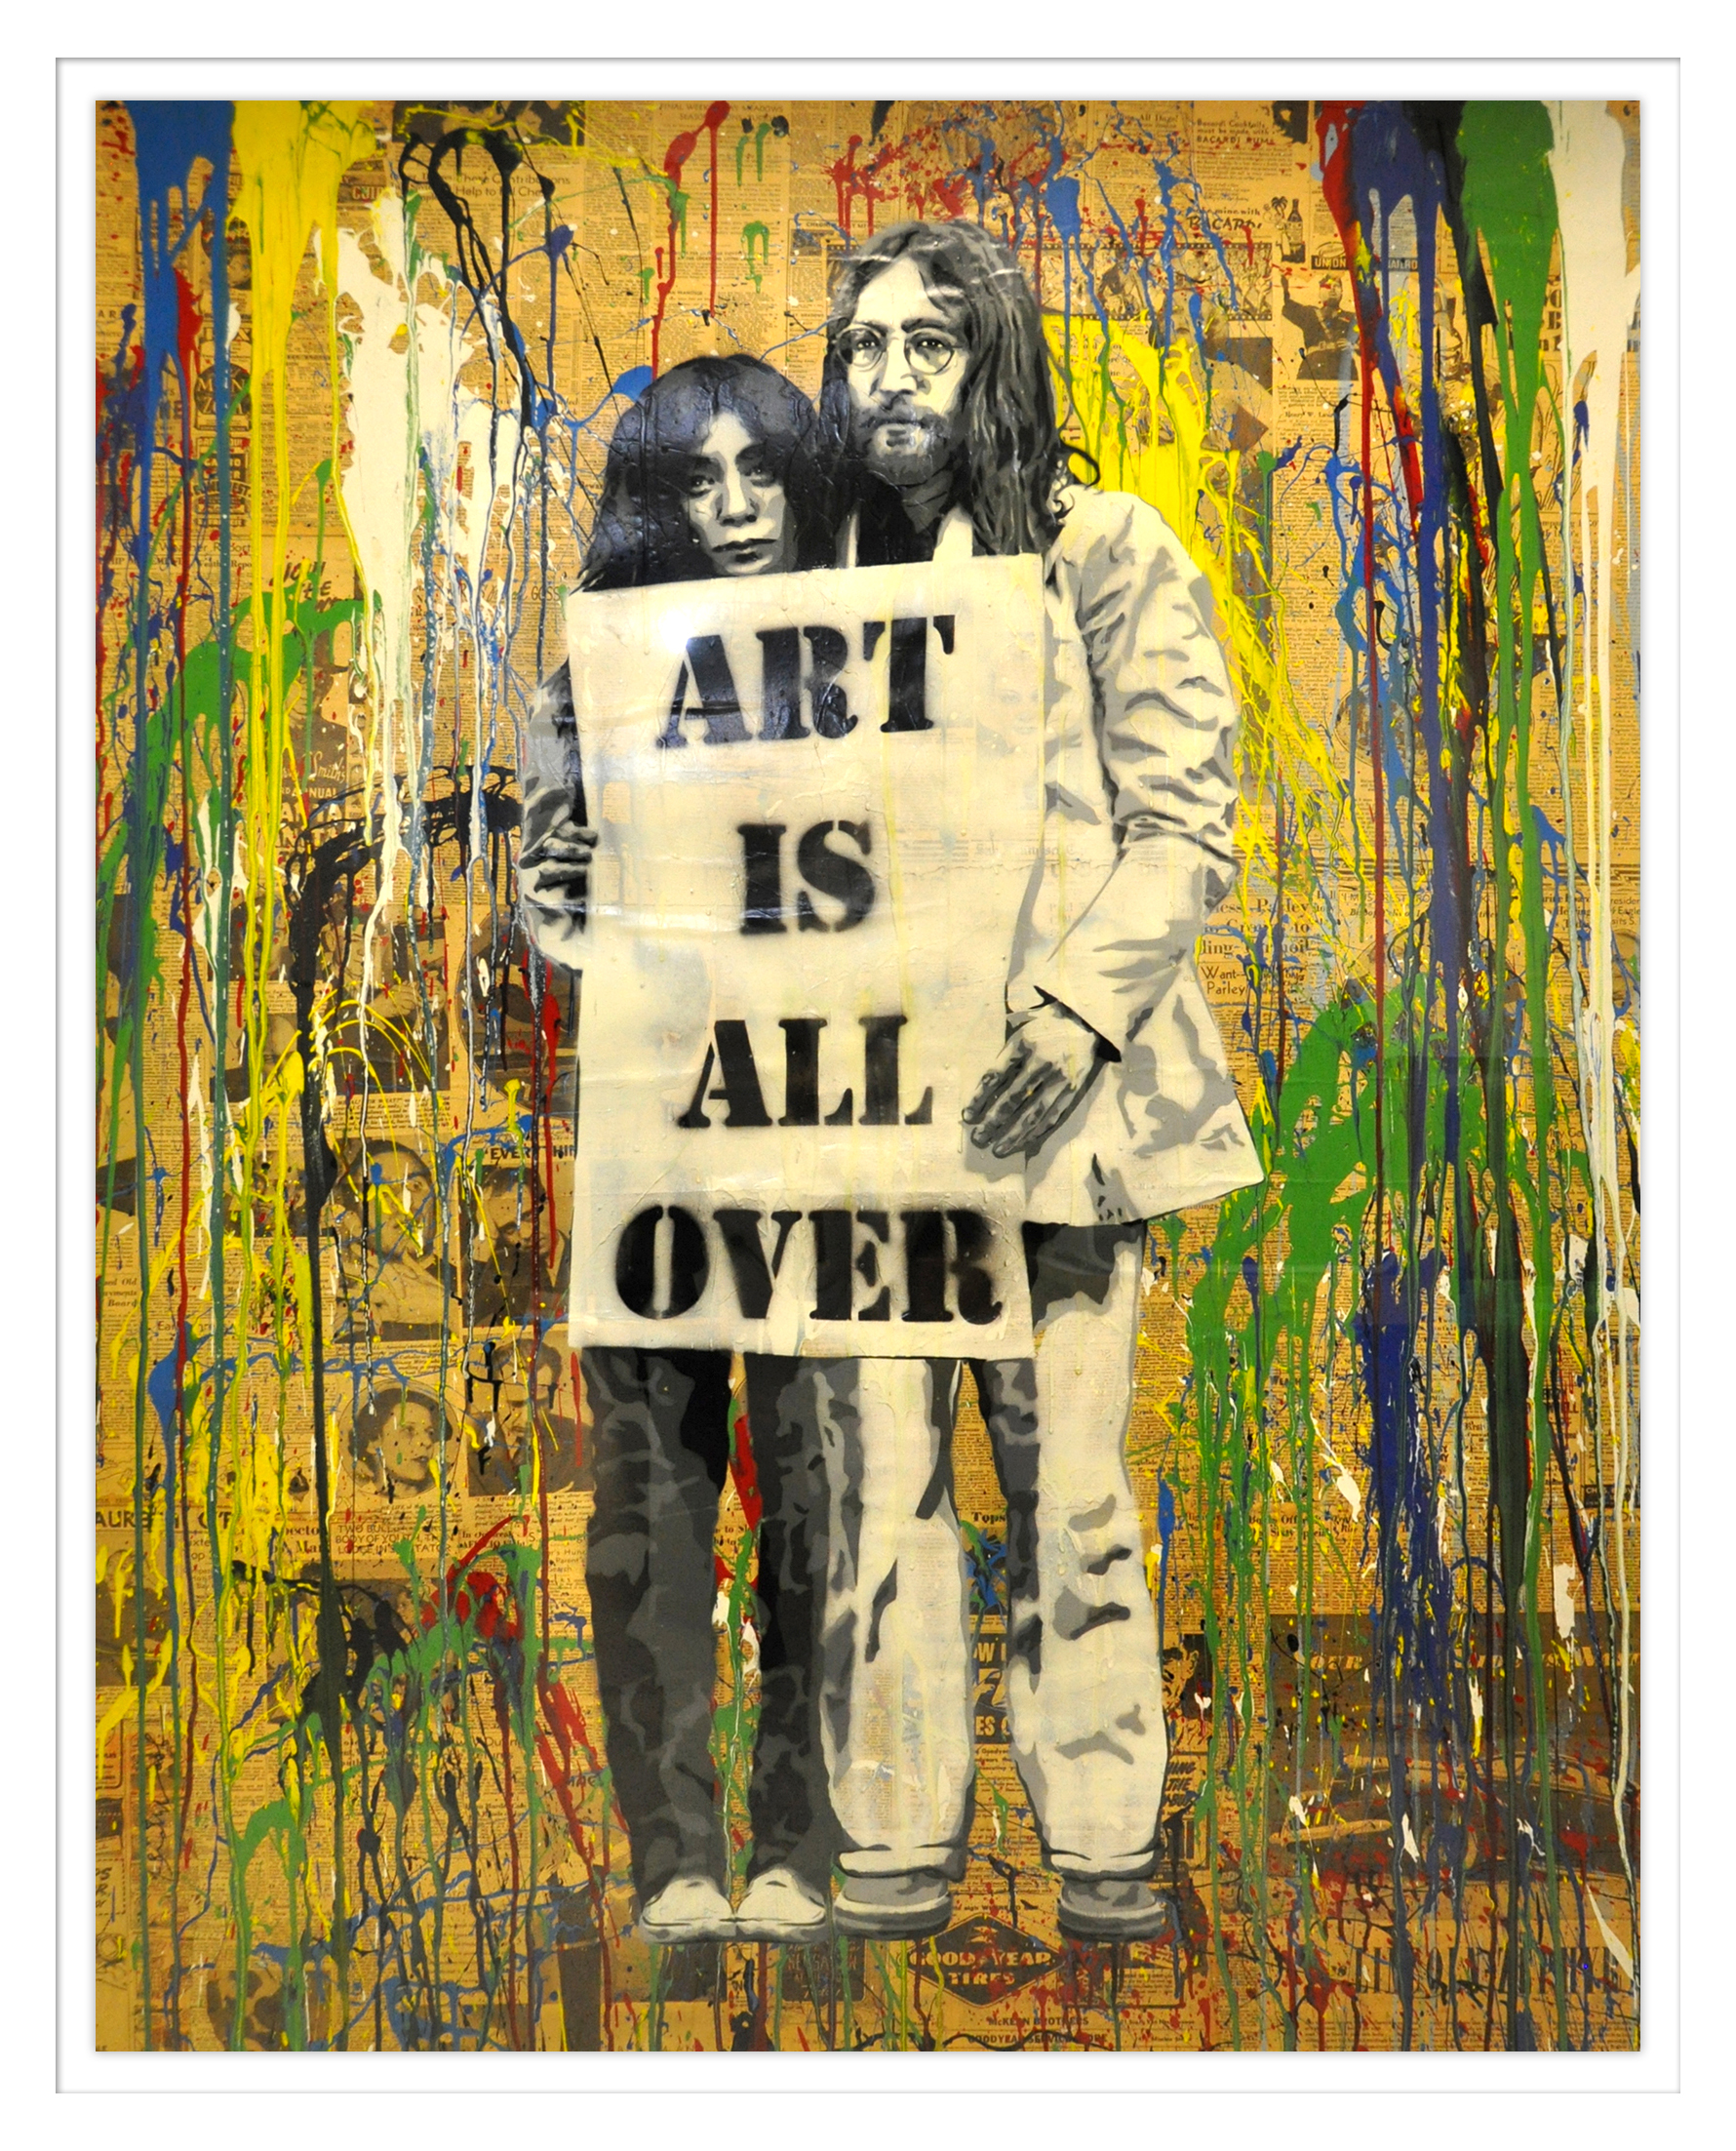 Mr. Brainwash - Art is all over , 9003-012-059